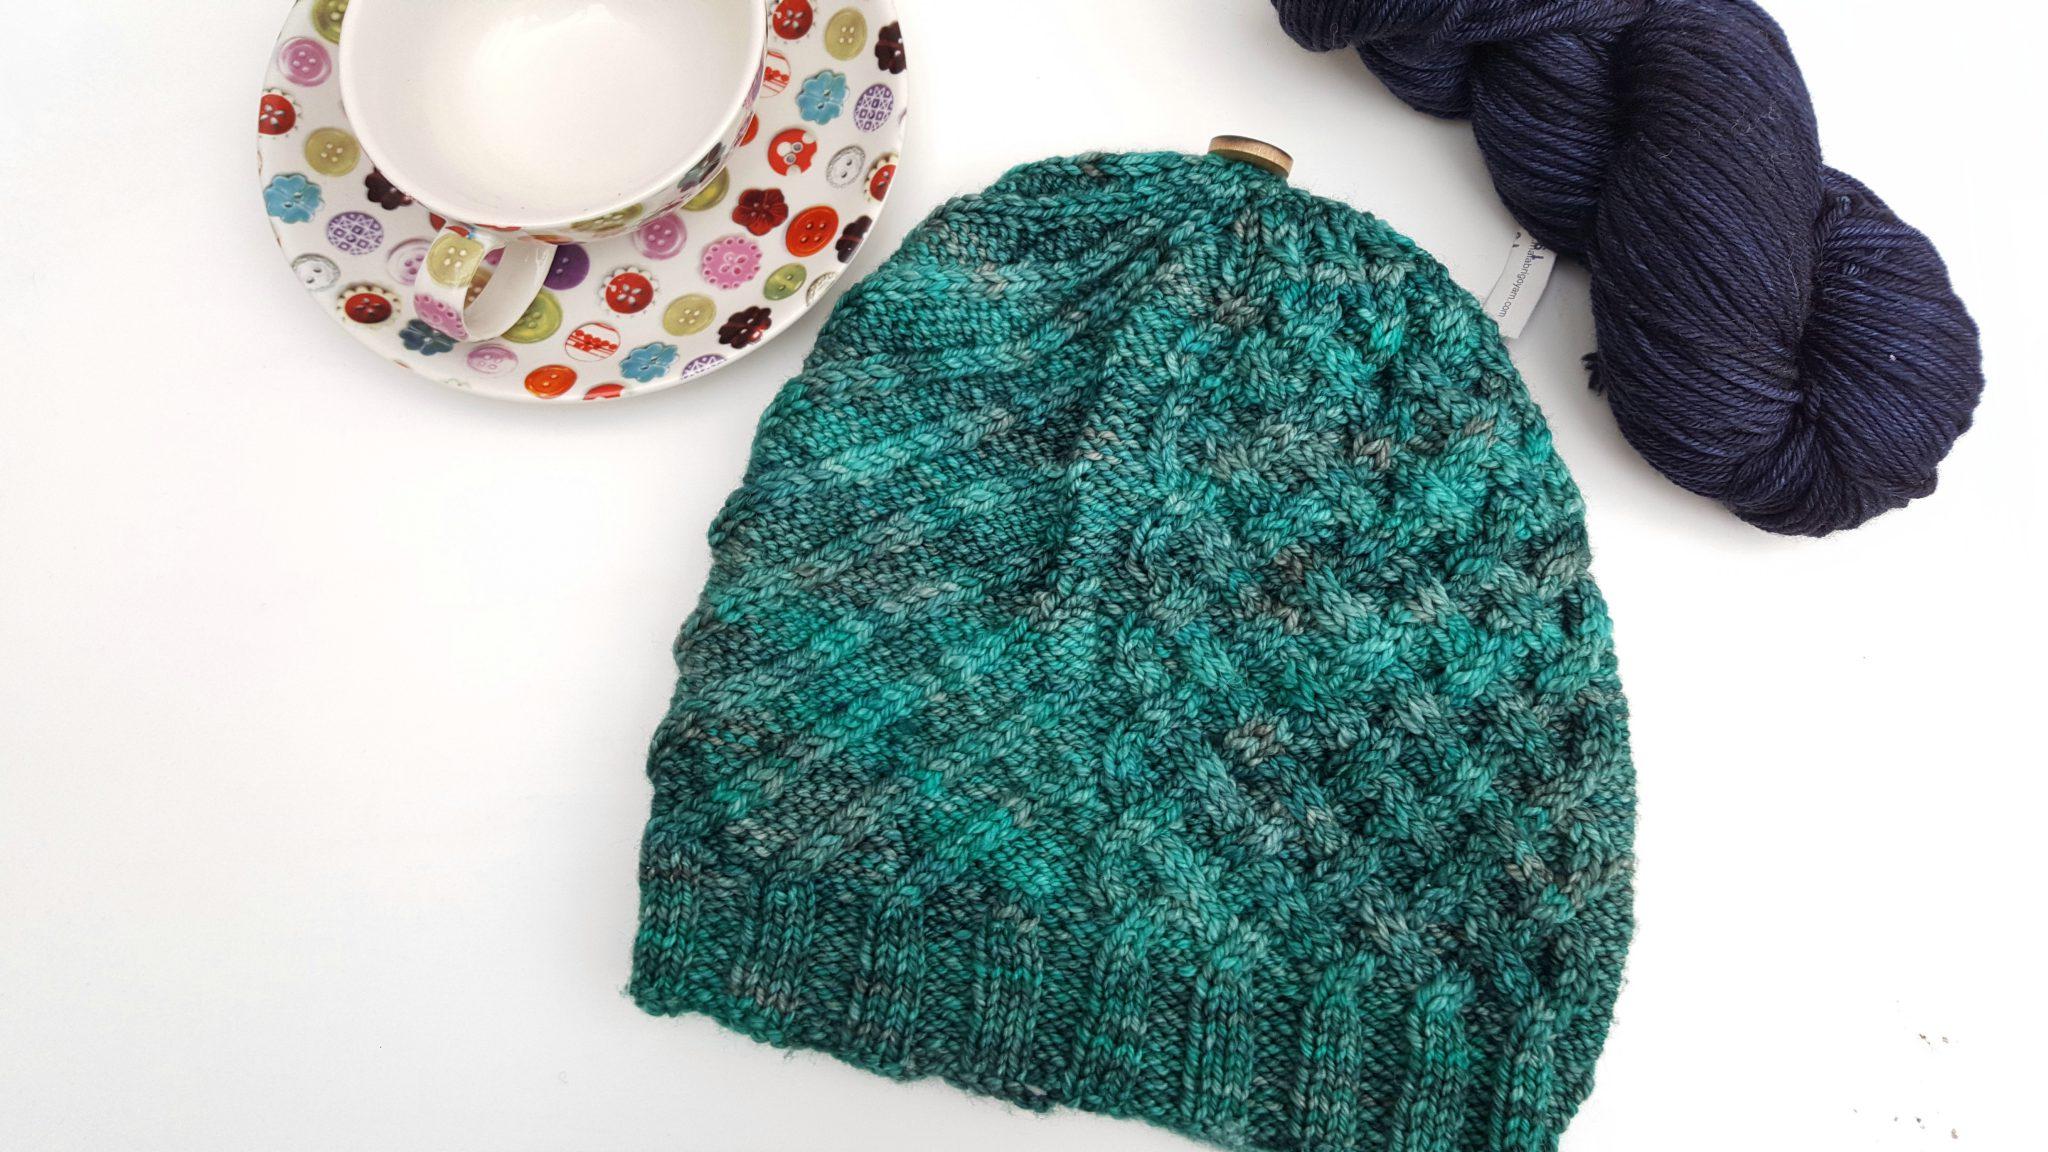 Craft | Hat-spiration: Inspiration for Handknit Hat Patterns